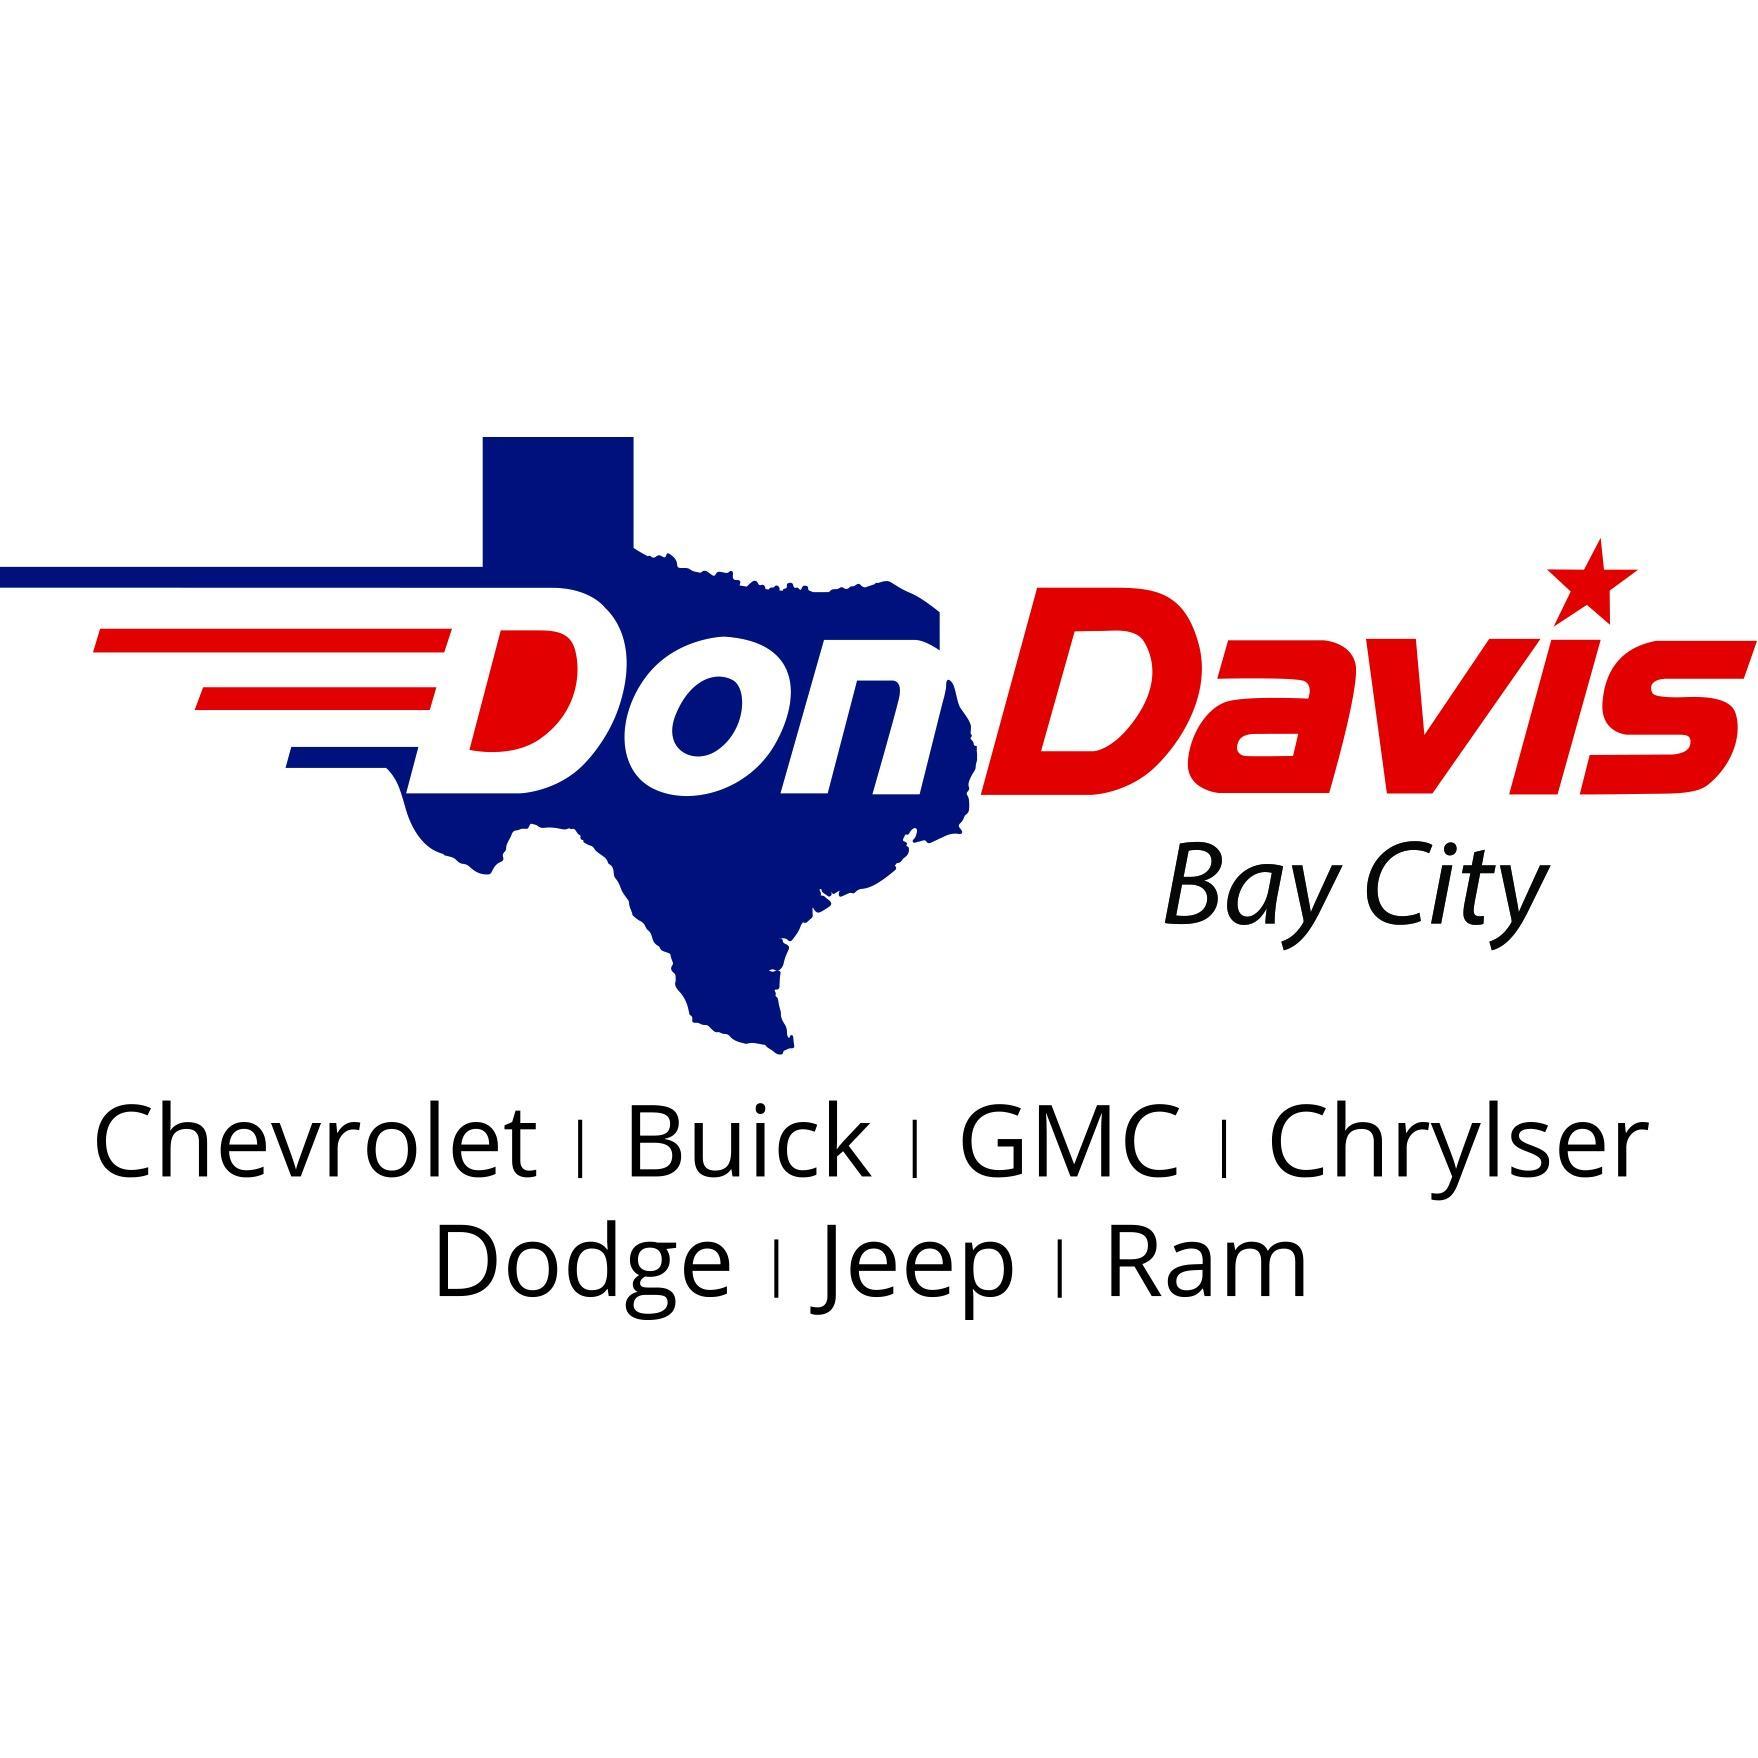 Don Davis Chevrolet Buick GMC Chrysler Dodge Jeep & Ram Bay City image 0